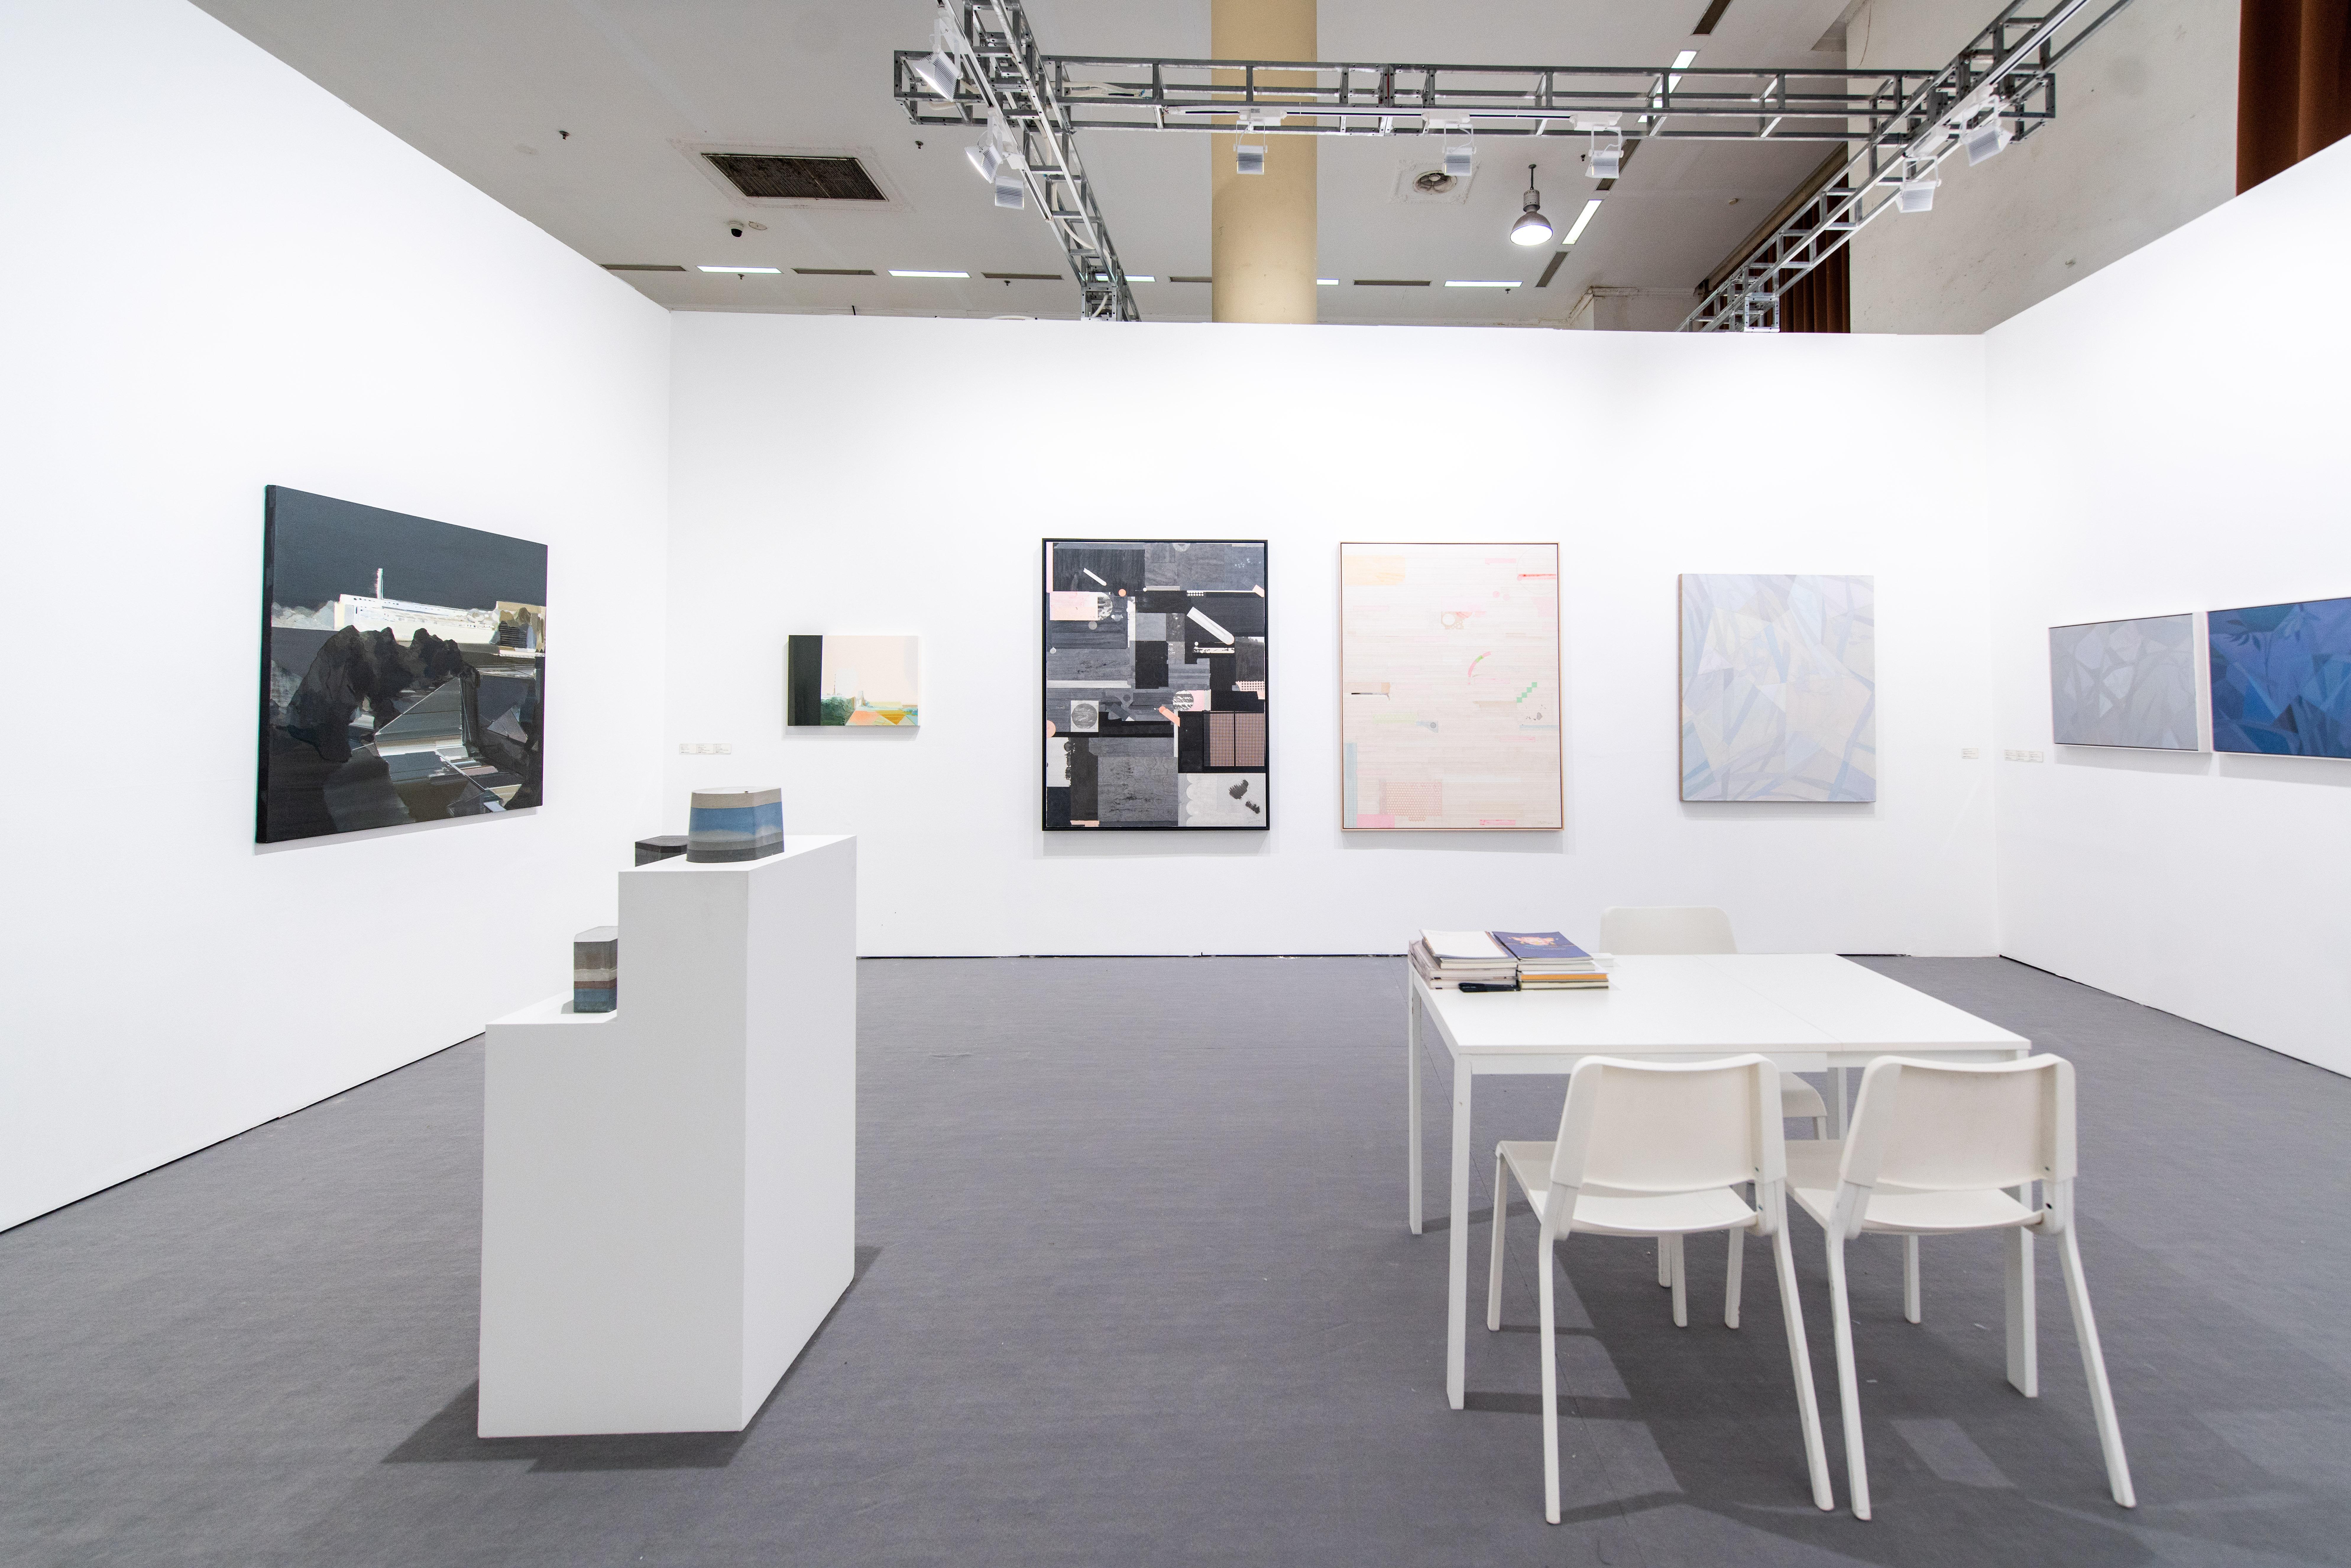 Hive Center for Contemporary Art